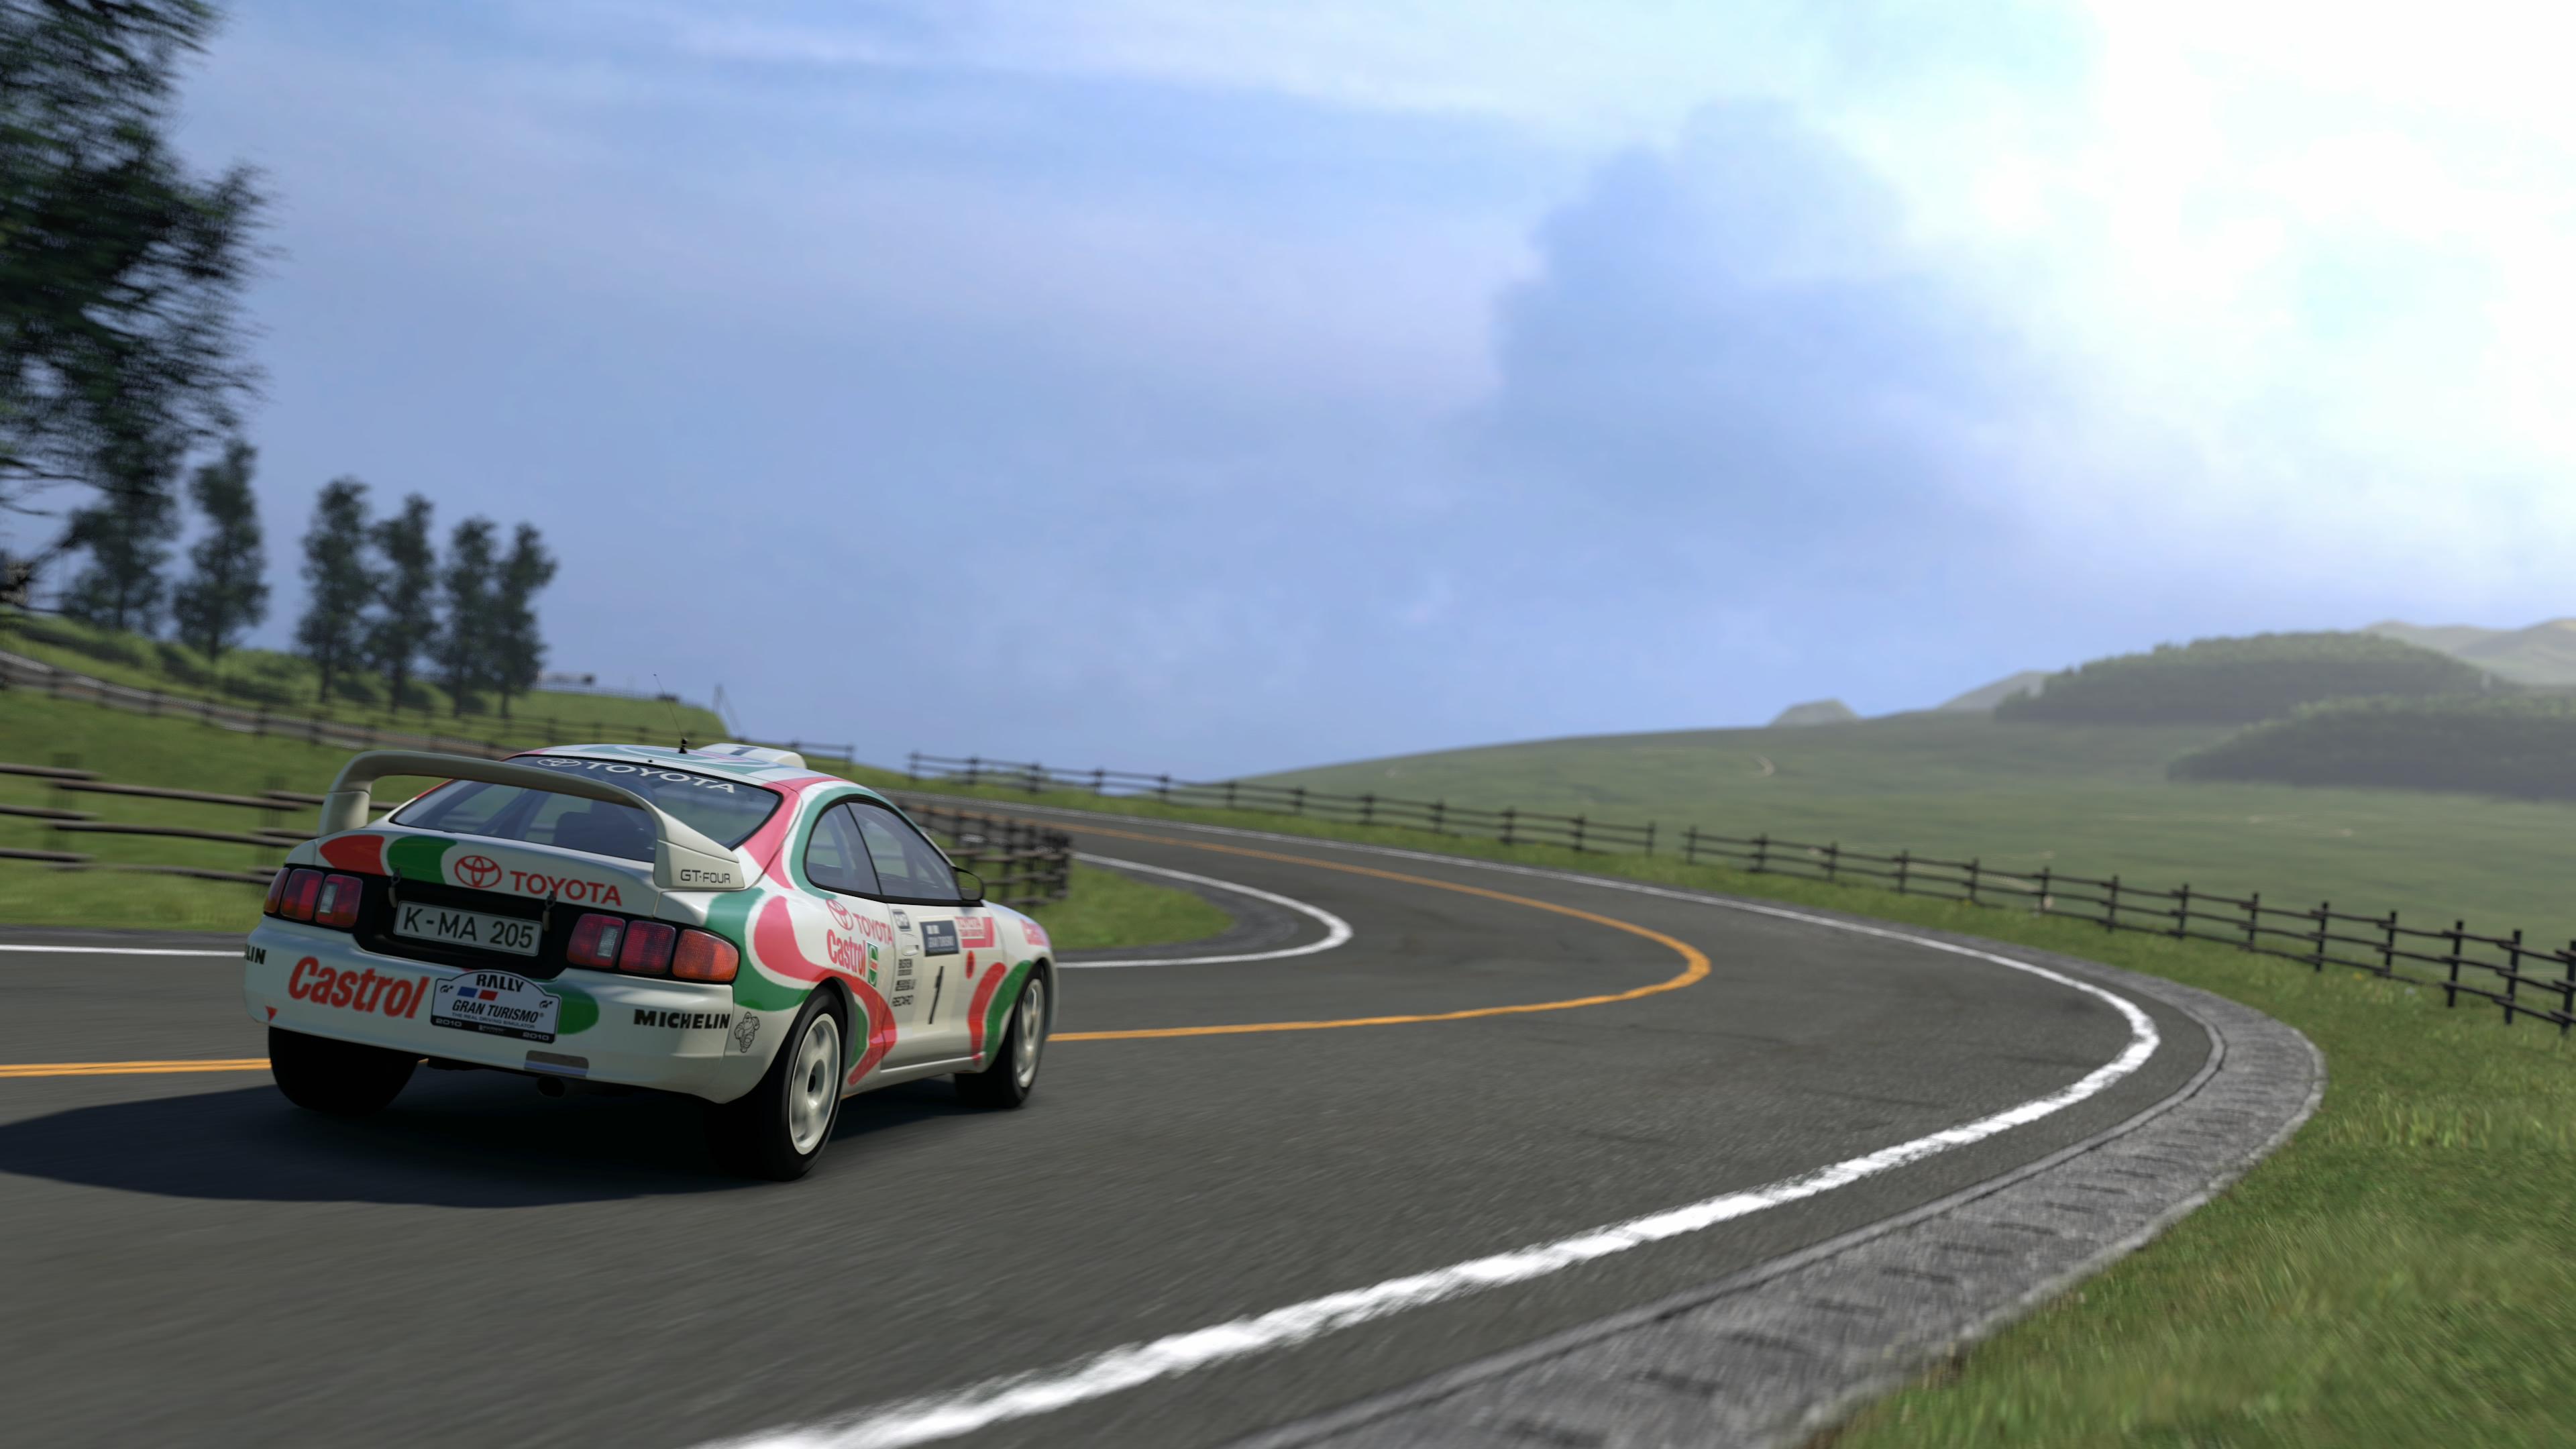 Toyota celica gt4 rally car photo